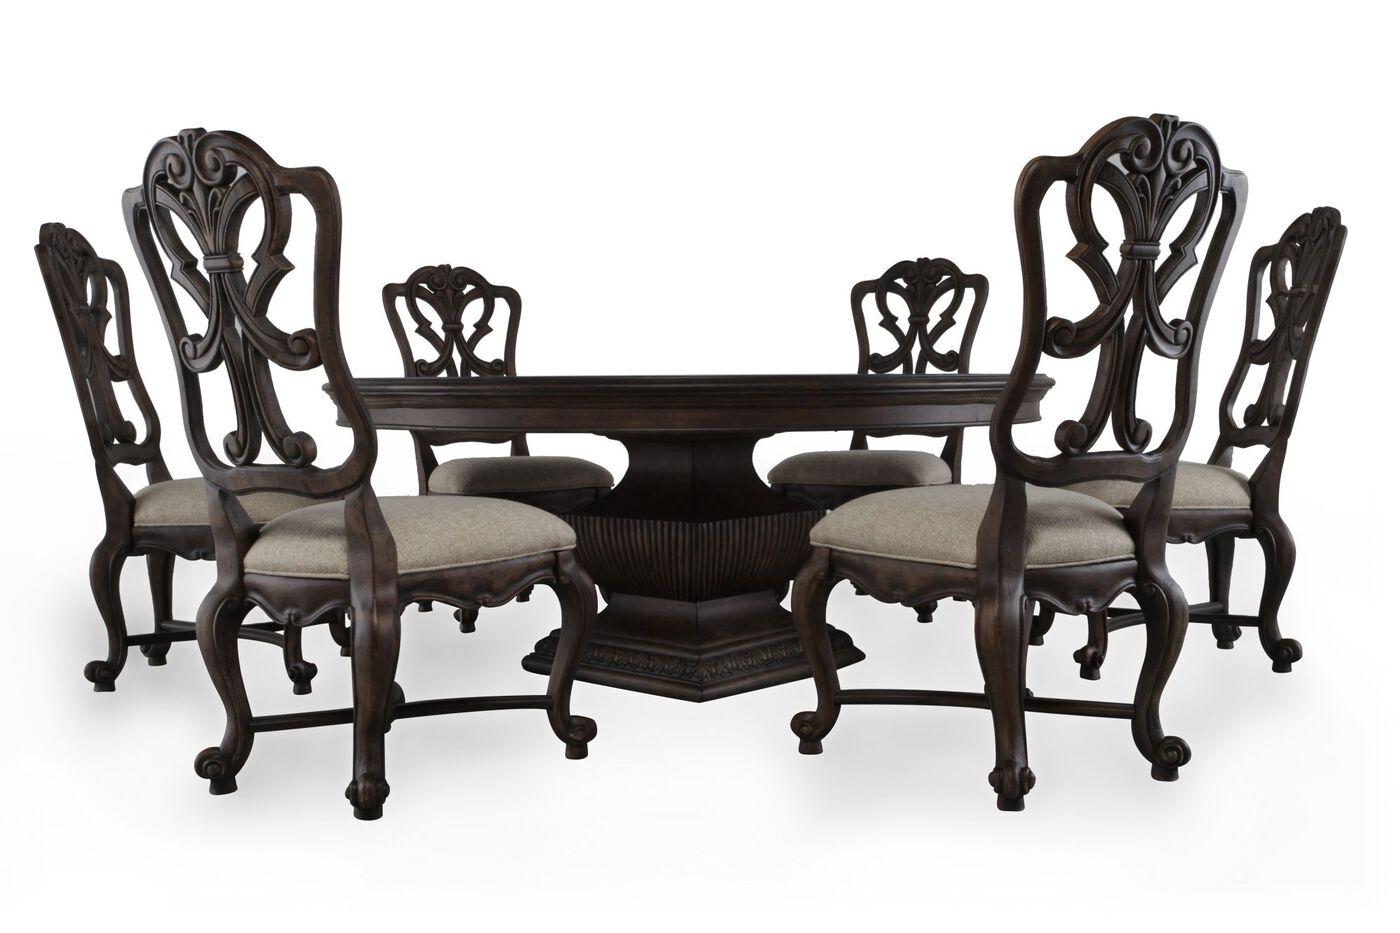 hooker rhapsody pedestal seven piece dining set: seven piece dining set